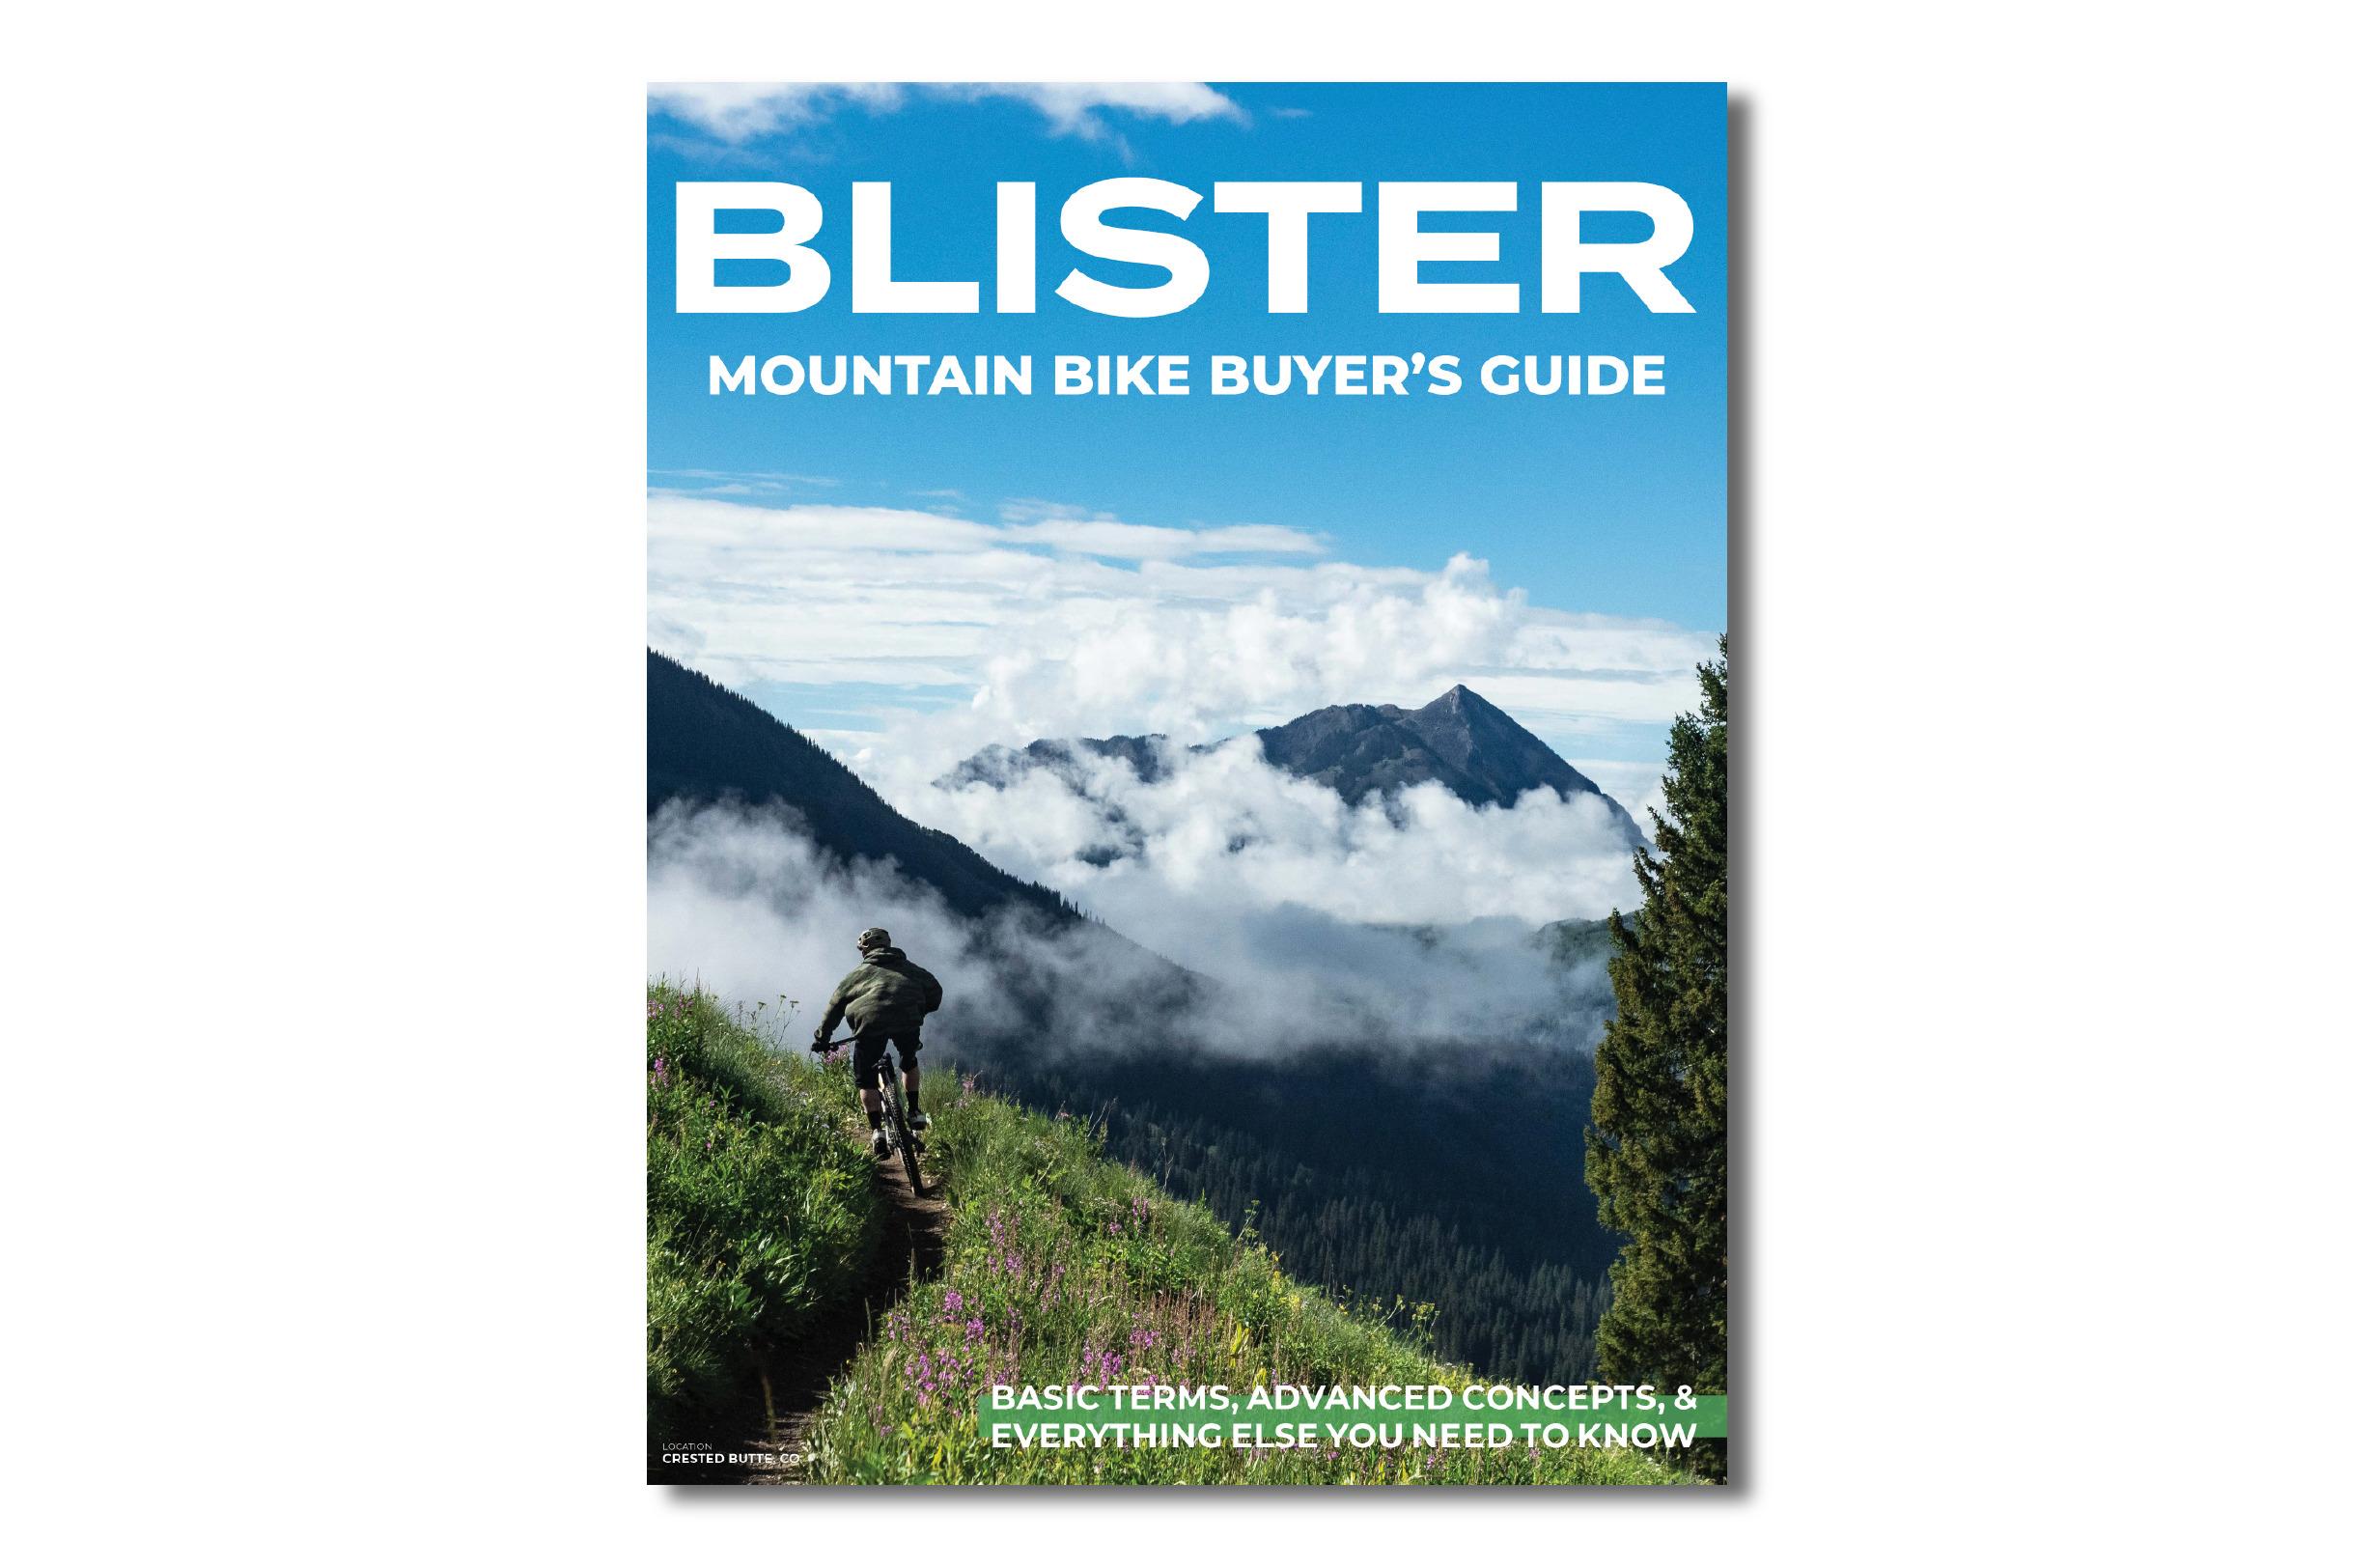 Blister Mountain Bike Buyer's Guide